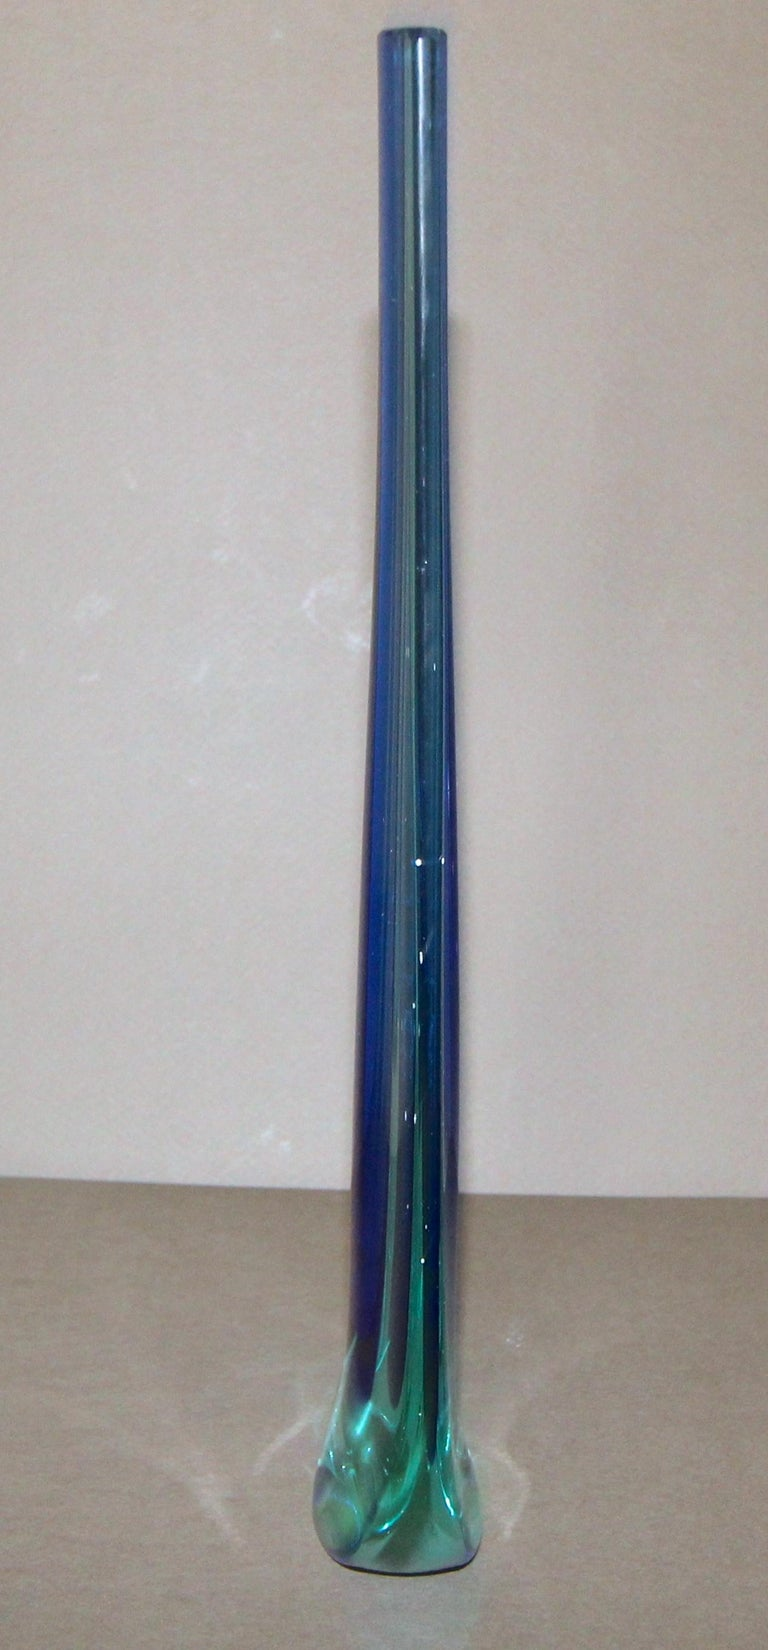 Murano Flavio Poli Seguso Blue Sommerso Glass Vetri d'Arte Teardrop Vase For Sale 3